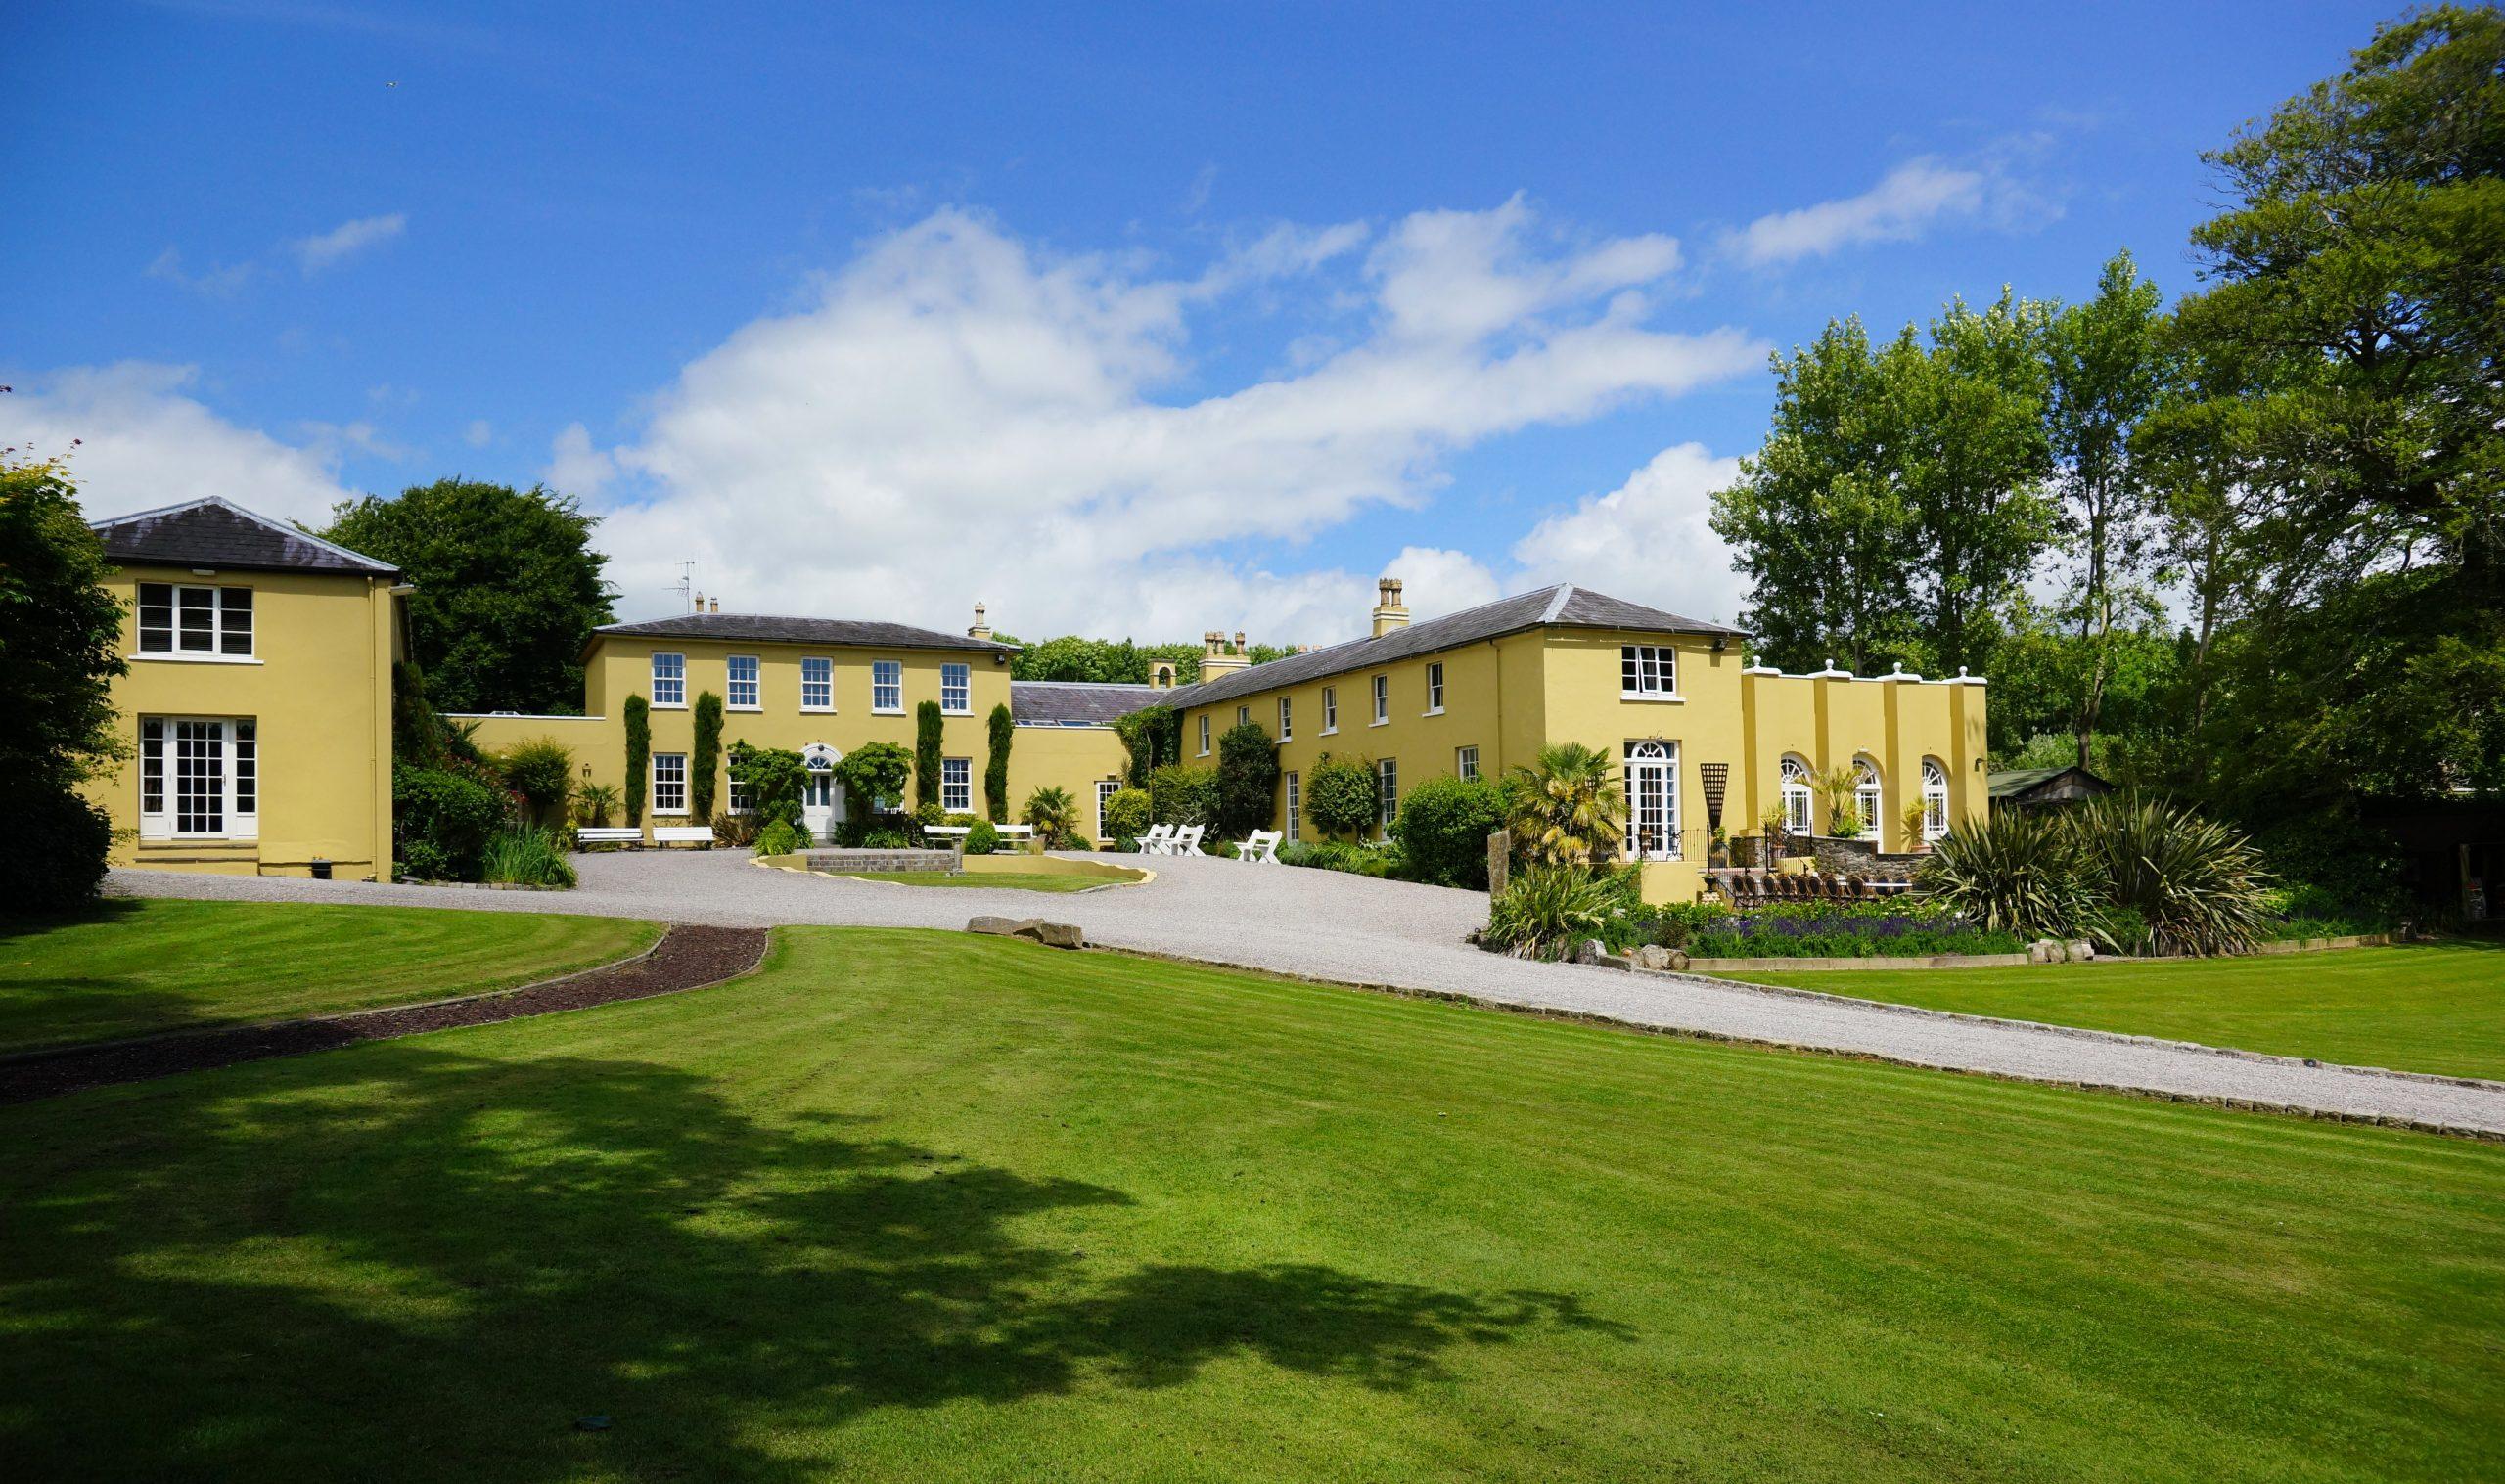 Ballinacurra House, Kinsale, Co. Cork